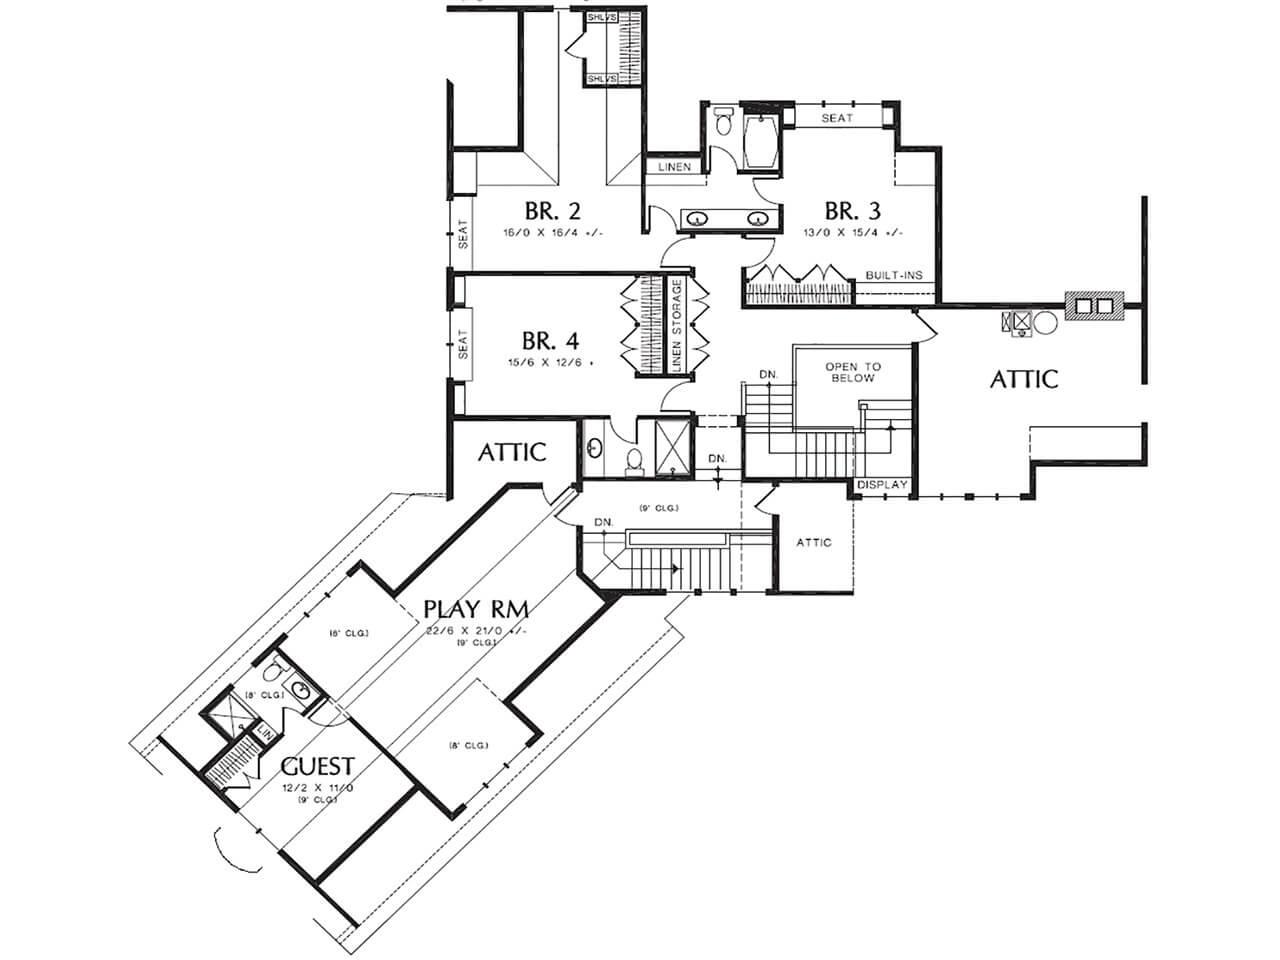 The Letterham Excel Builders